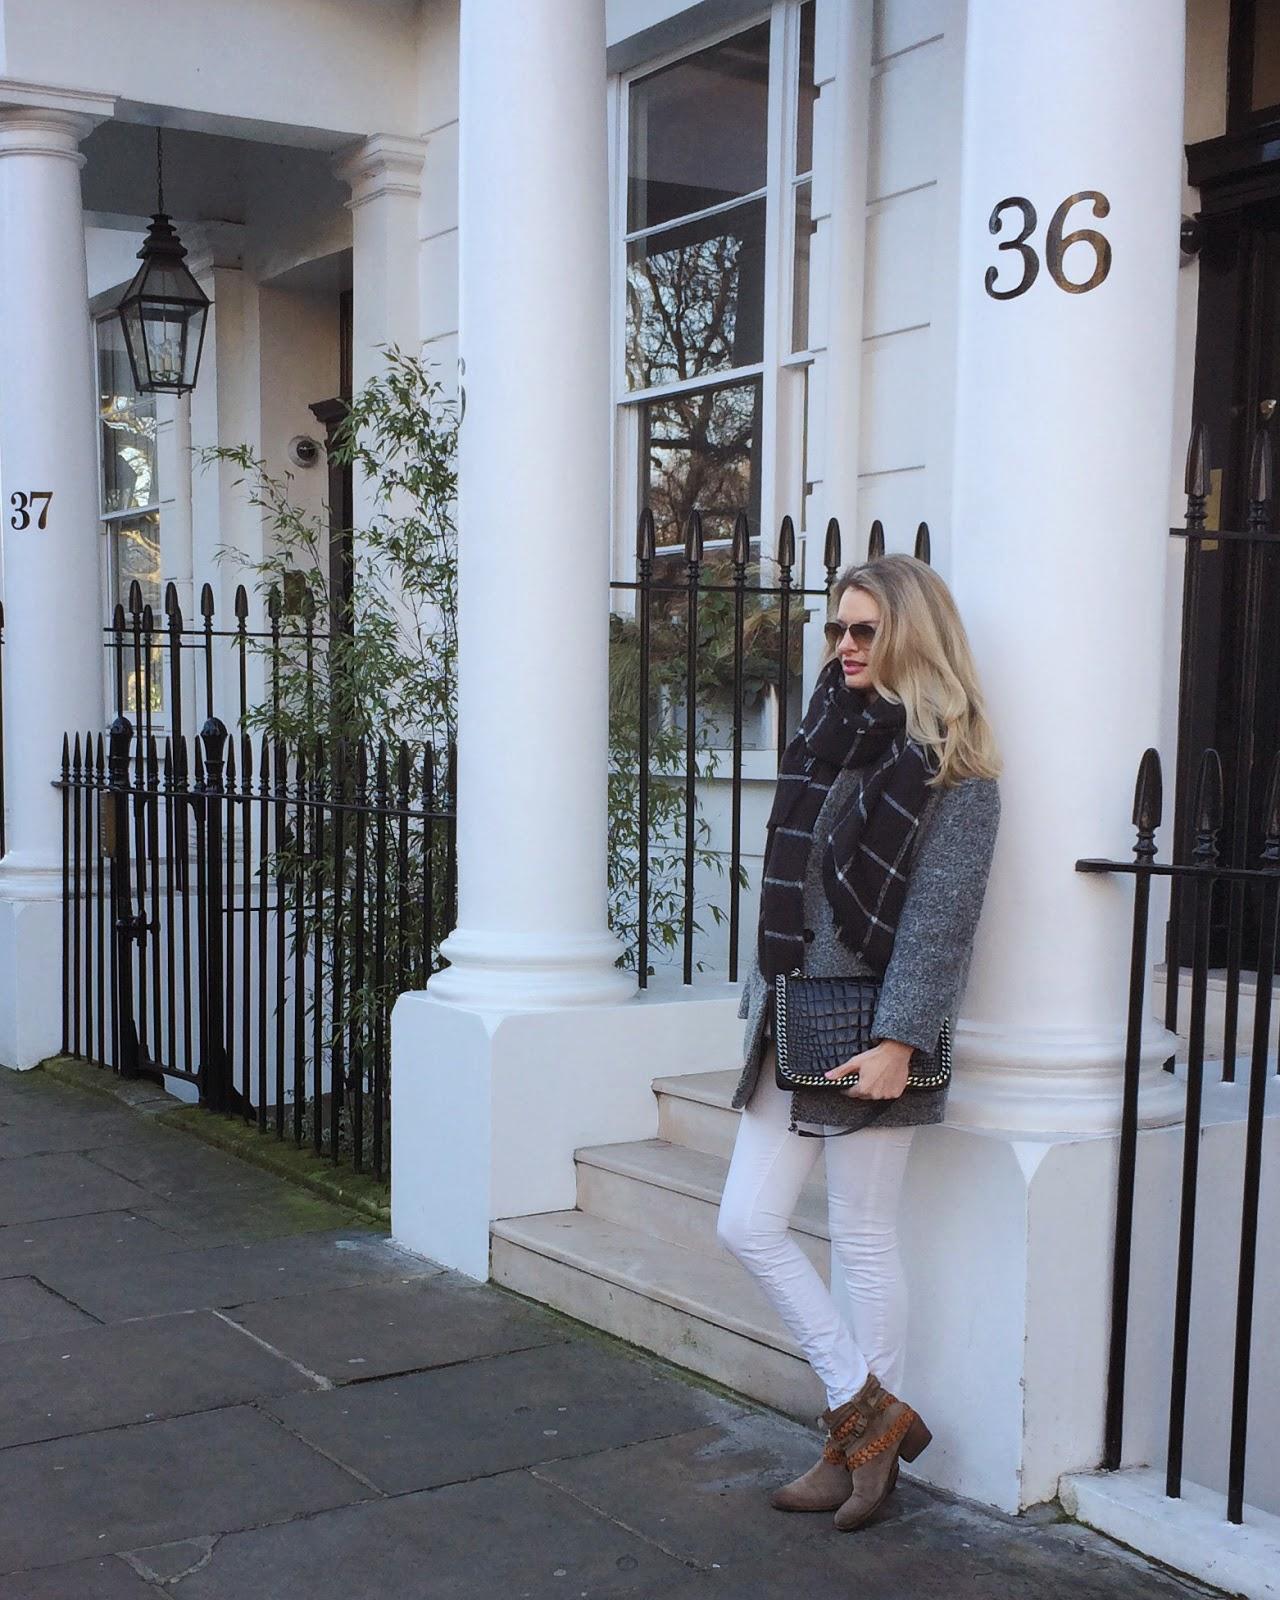 window pane print scarf, maxi scarf, blanket scarf, white jeans, beige boots, zara flap bag croco, fashion blogger, london, london street style, london blogger